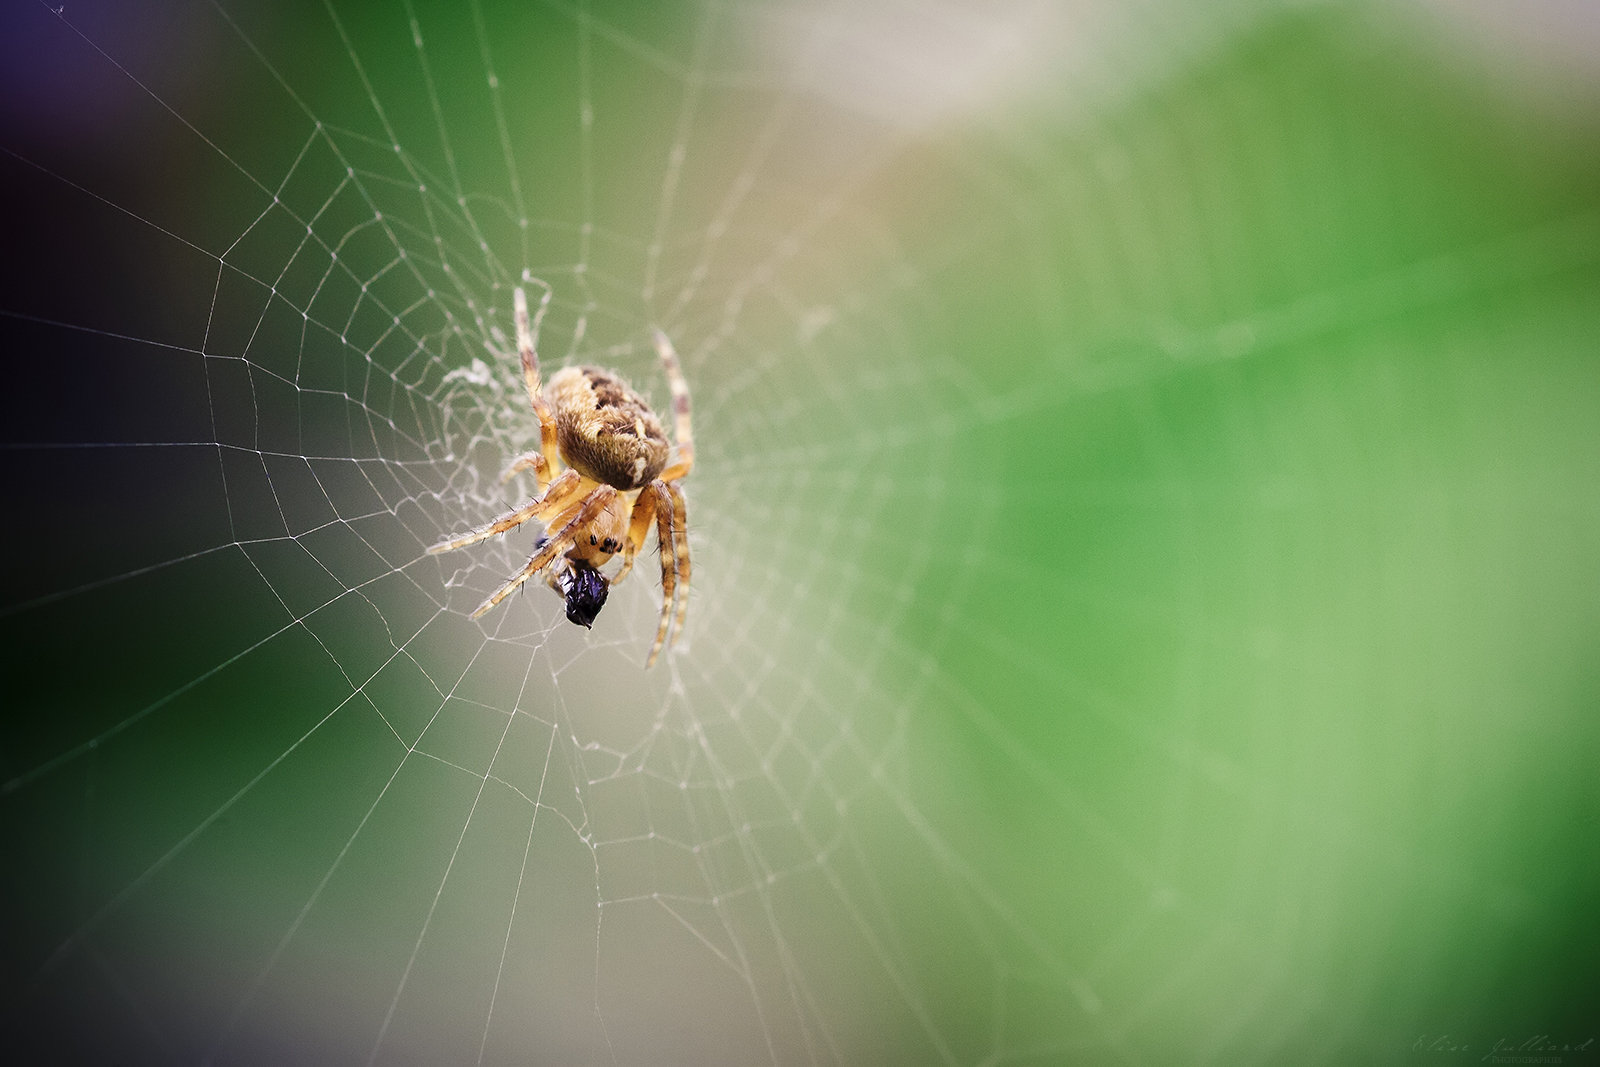 elise-julliard-photographe-lyon-photo-macro-araignee-epeire-diademe